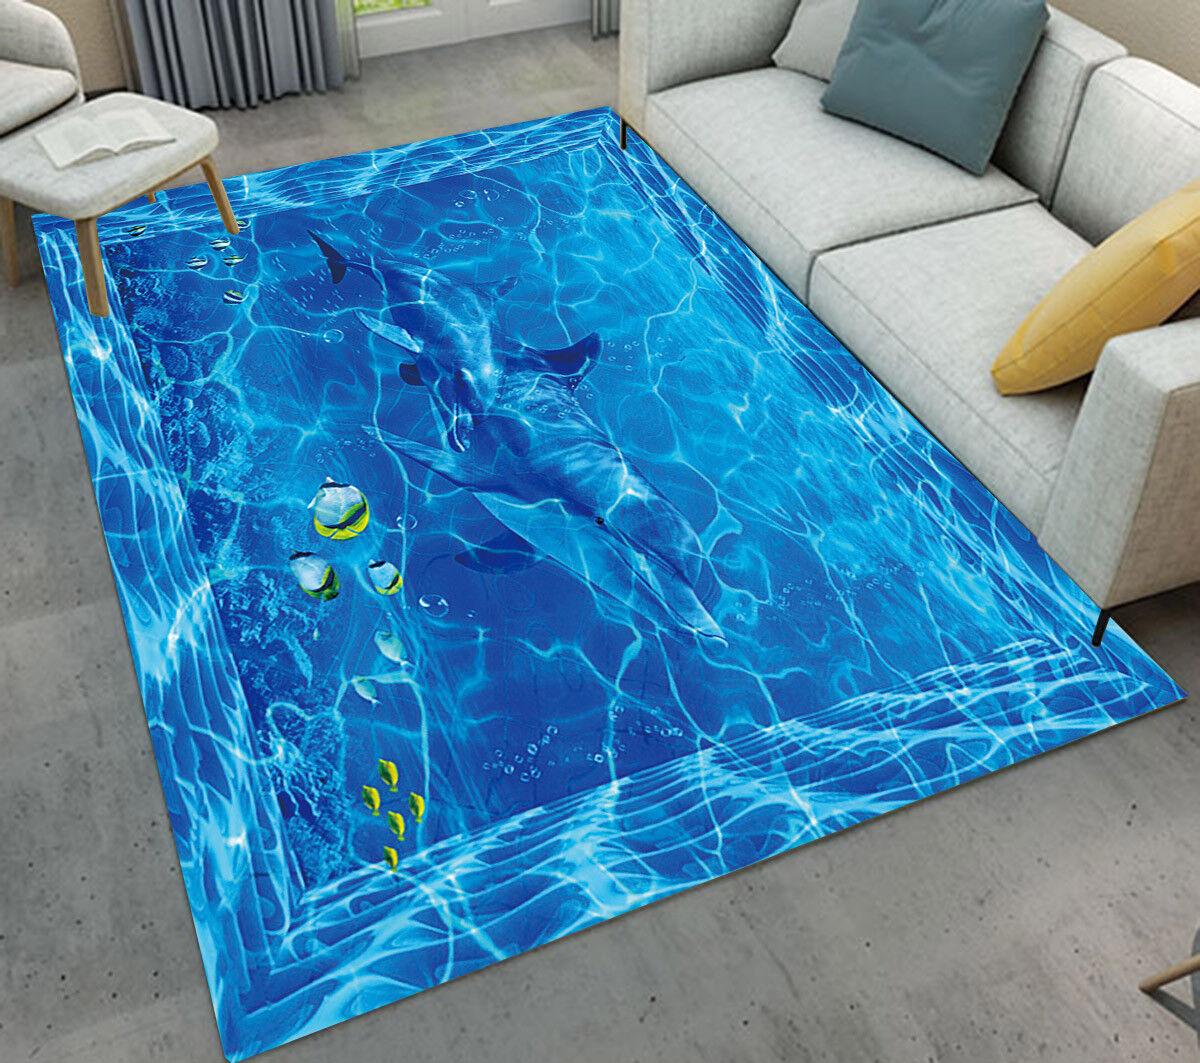 Blue Sea Water Fish Soft Carpet Kid Living Room Floor Mat Home Fashion Area Rug Ebay